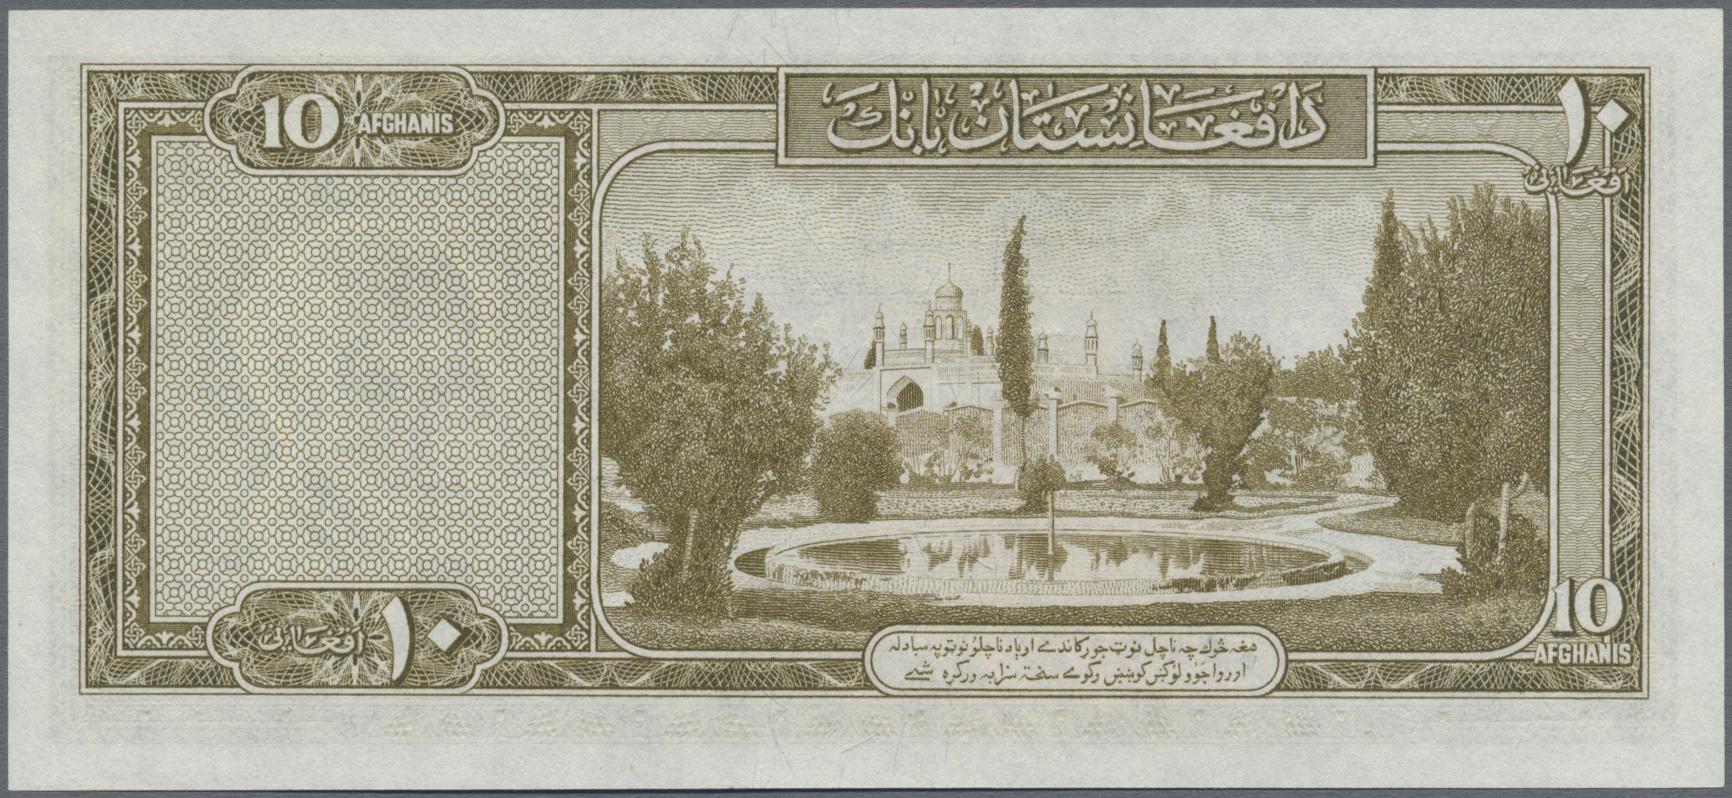 Lot 00002 - Afghanistan | Banknoten  -  Auktionshaus Christoph Gärtner GmbH & Co. KG Sale #48 The Banknotes